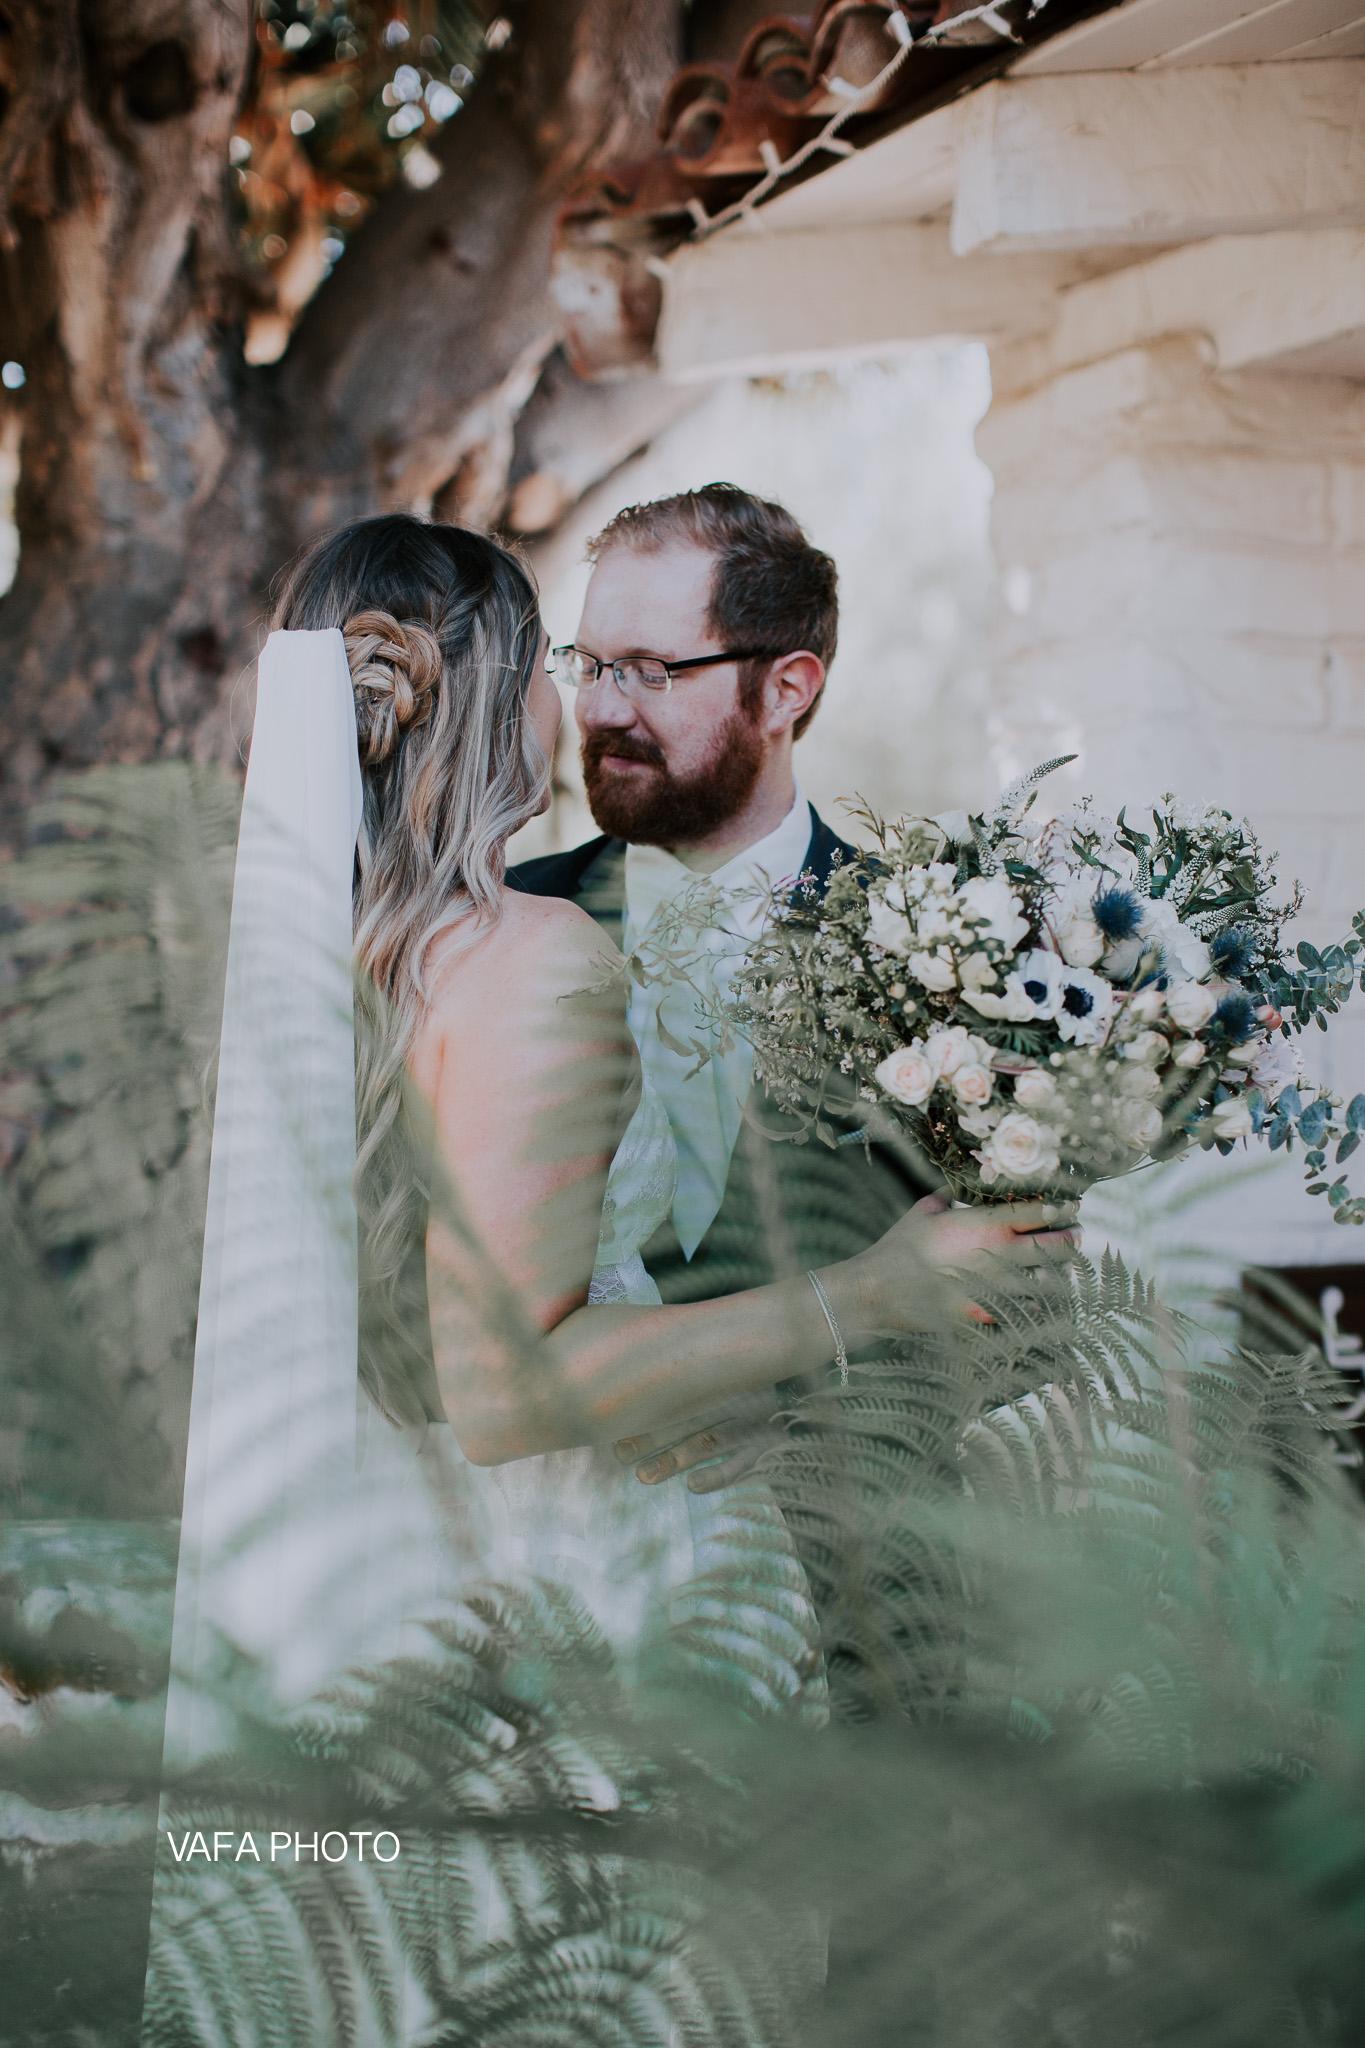 Leo-Carrillo-Ranch-Wedding-Lauren-Mike-Vafa-Photo-255.jpg